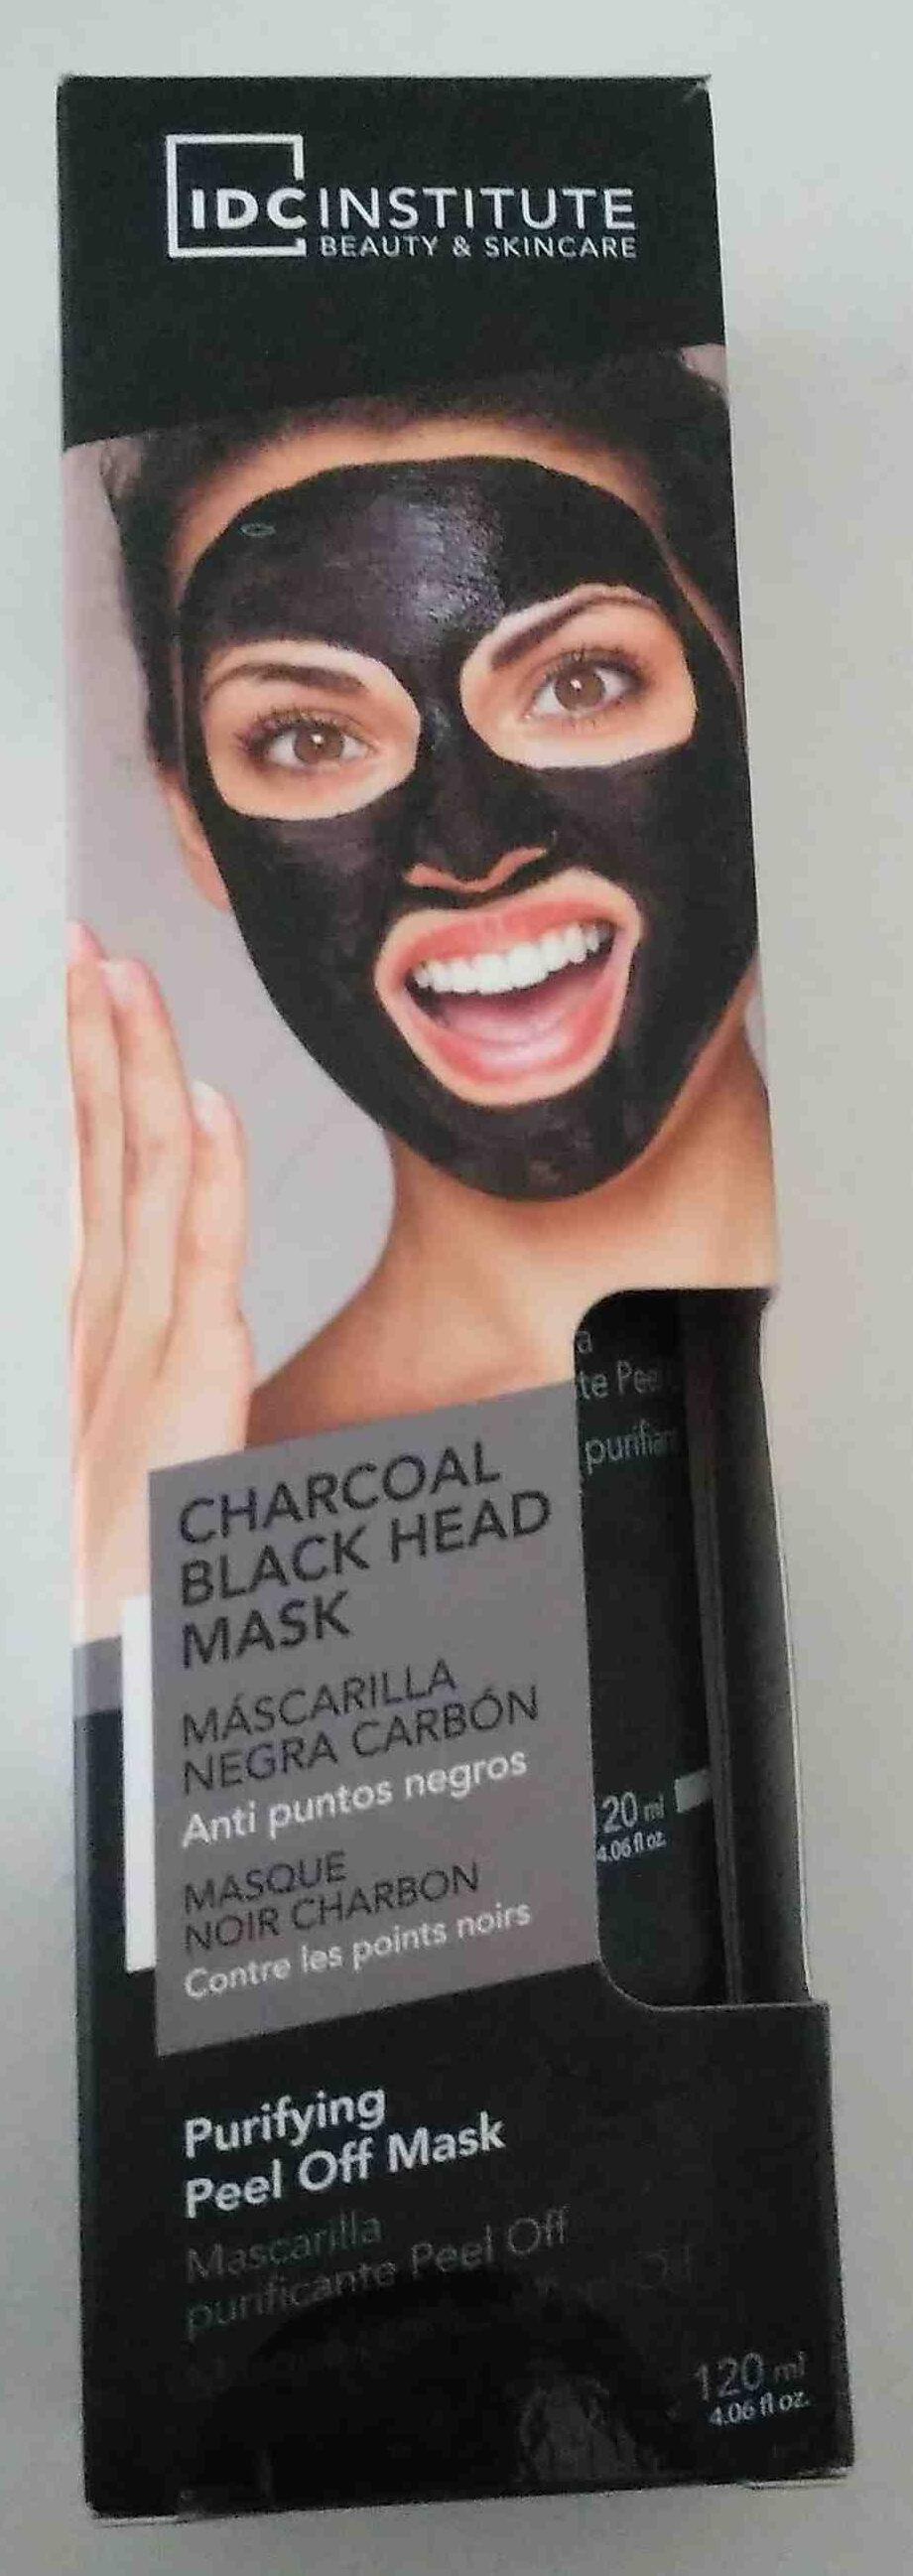 Mascarilla Negra Carbon - Product - en